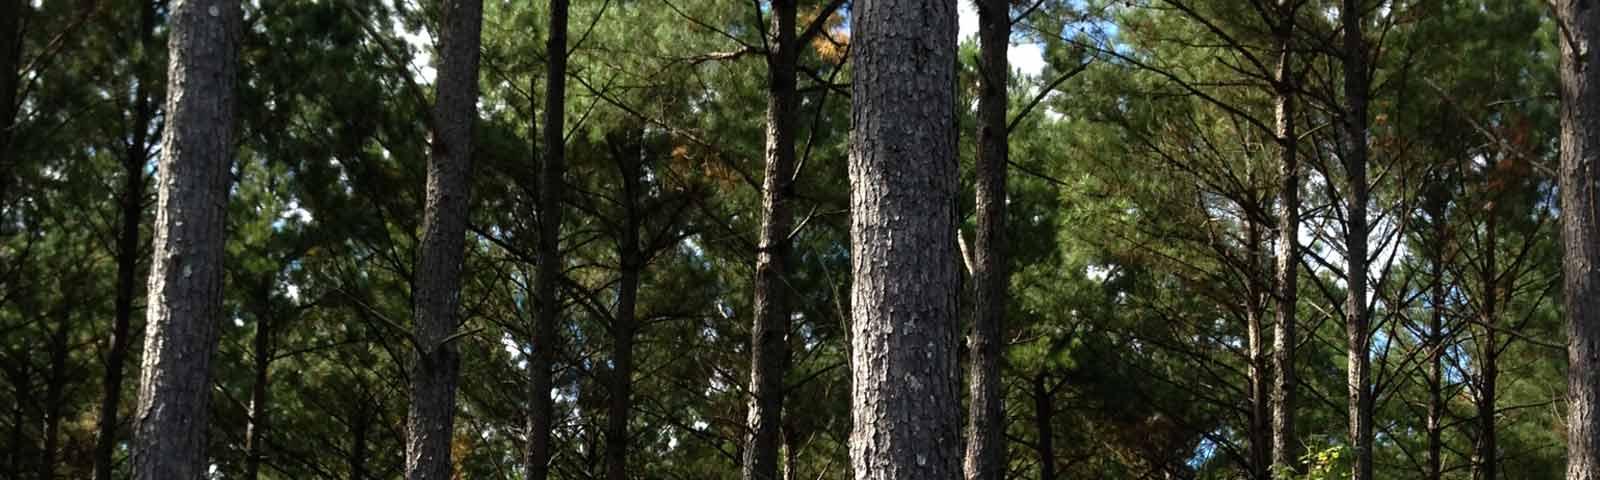 Pine/Oaks Land & Timber